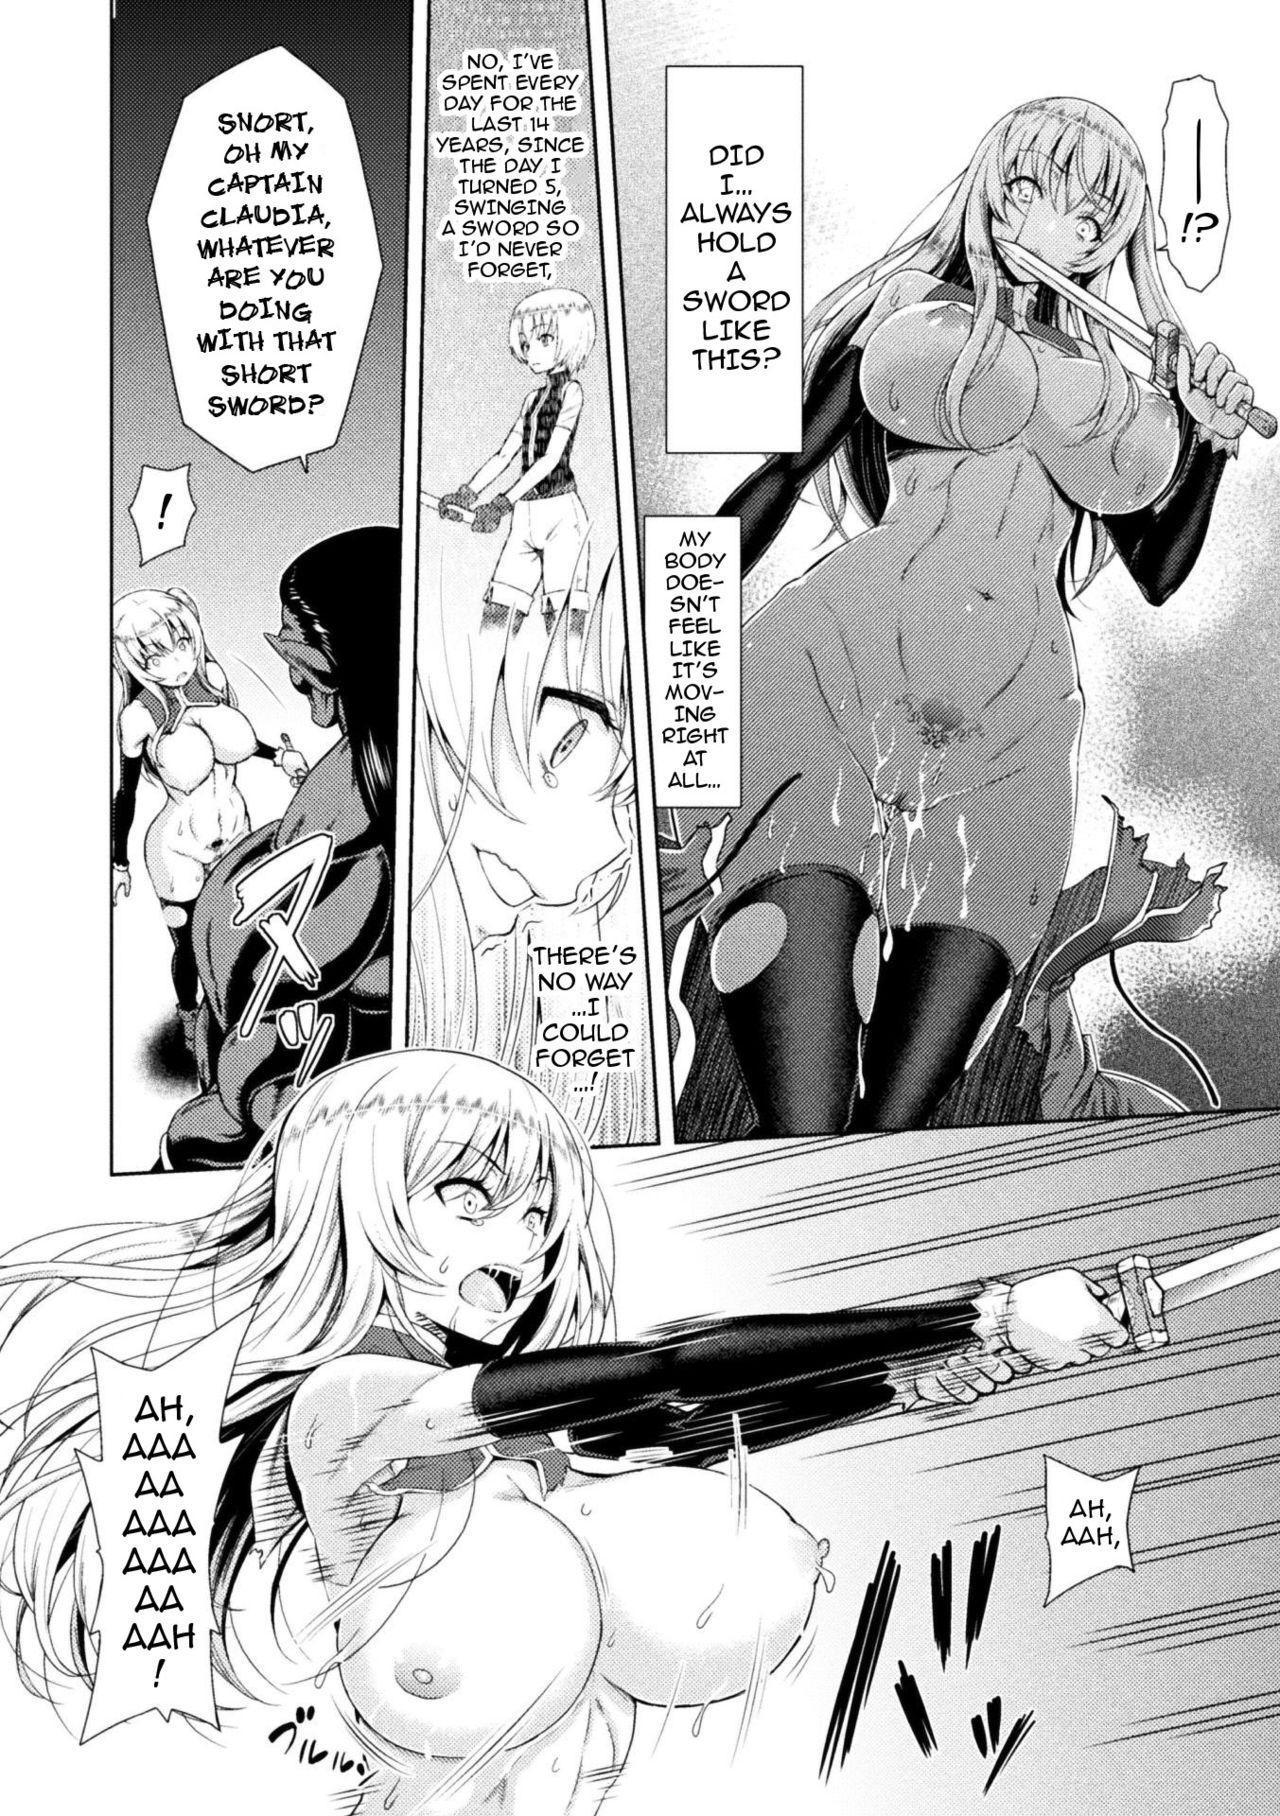 [Yamada Gogogo] Erona ~Orc no Inmon ni Okasareta Onna Kishi no Matsuro~ | Erona ~The Fall of a Beautiful Knight Cursed with the Lewd Mark of an Orc~ Ch. 1-6 [English] [darknight] [Decensored] [ongoing] 41